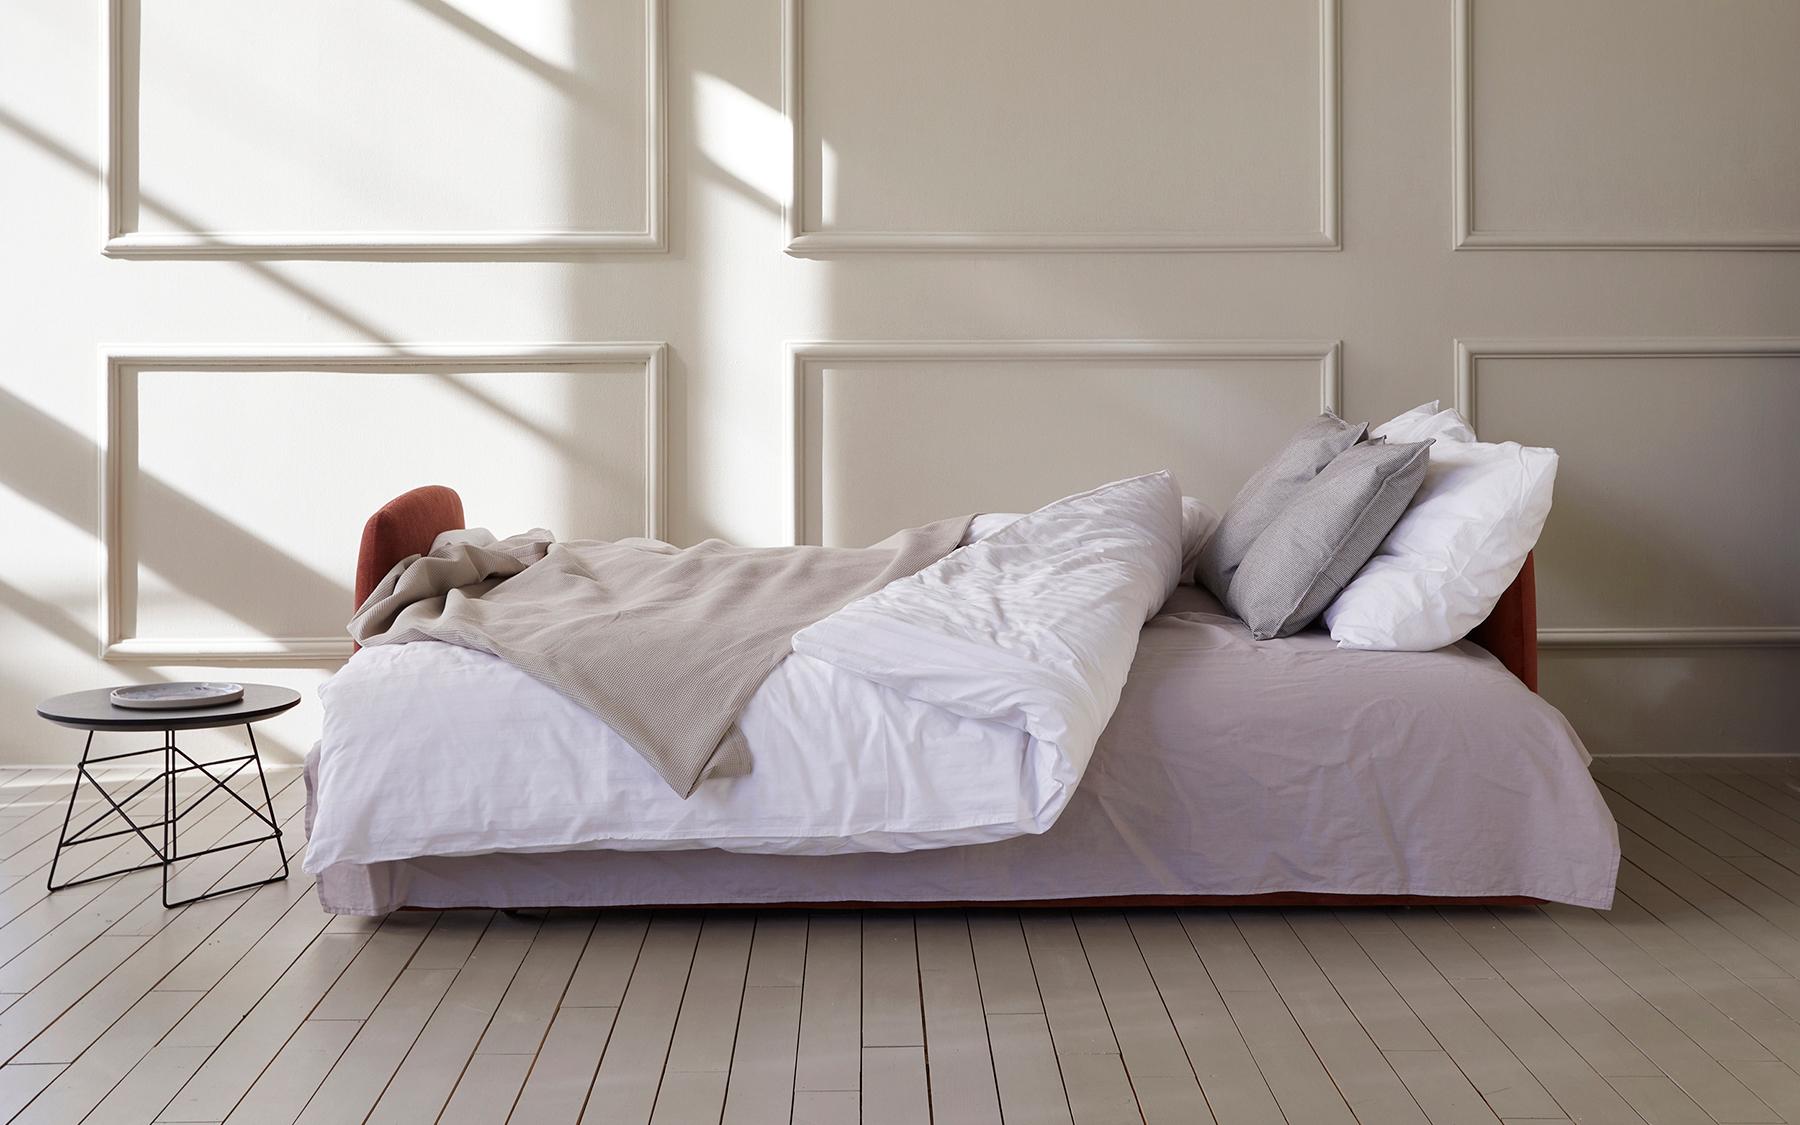 media/image/Salla-Sofa-Bed-317-e3-web.jpg